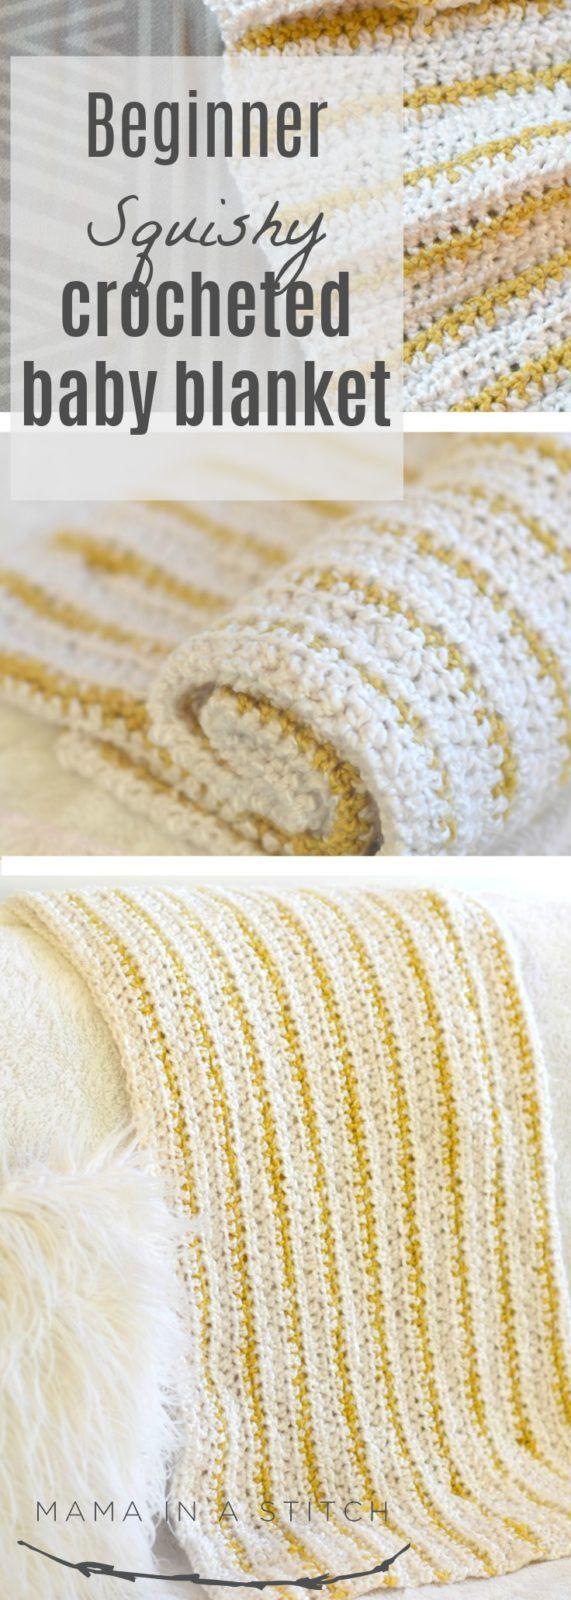 Soft Beginner Crochet Blanket Pattern via @MamaInAStitch Free pattern that's super easy! #diy #crafts